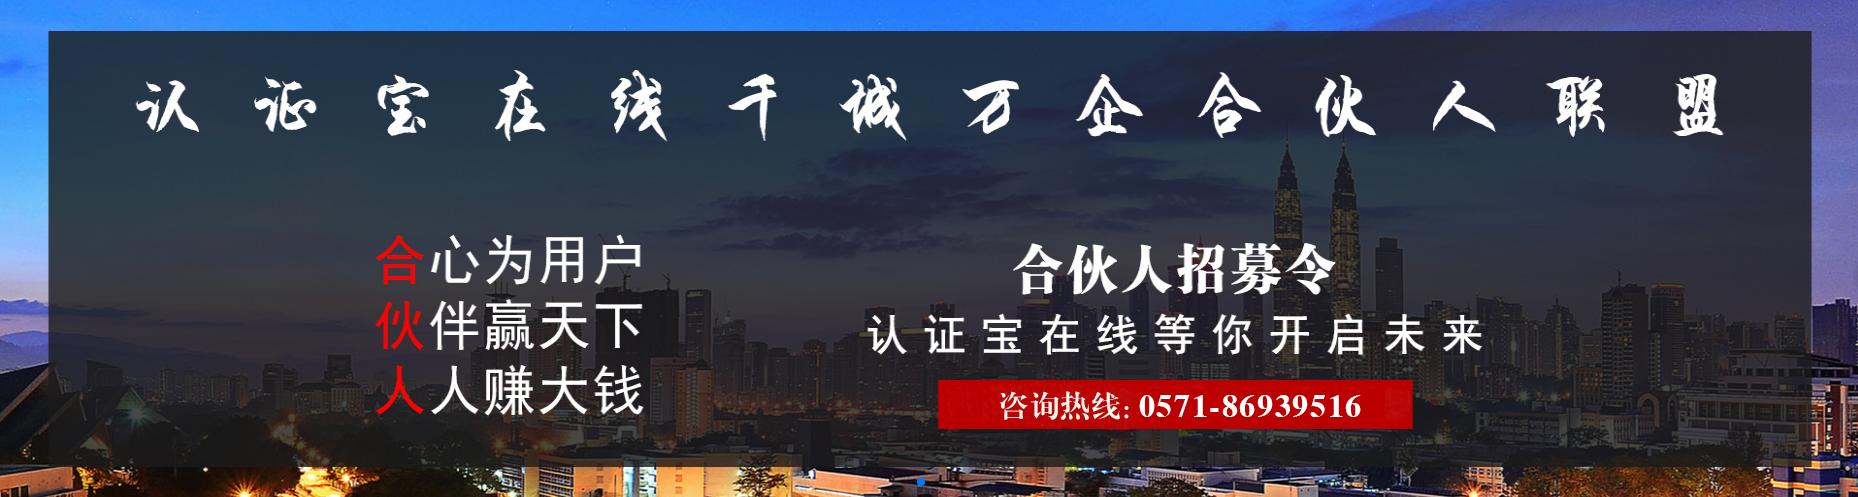 PC首页banner图认证宝在线企业合伙人